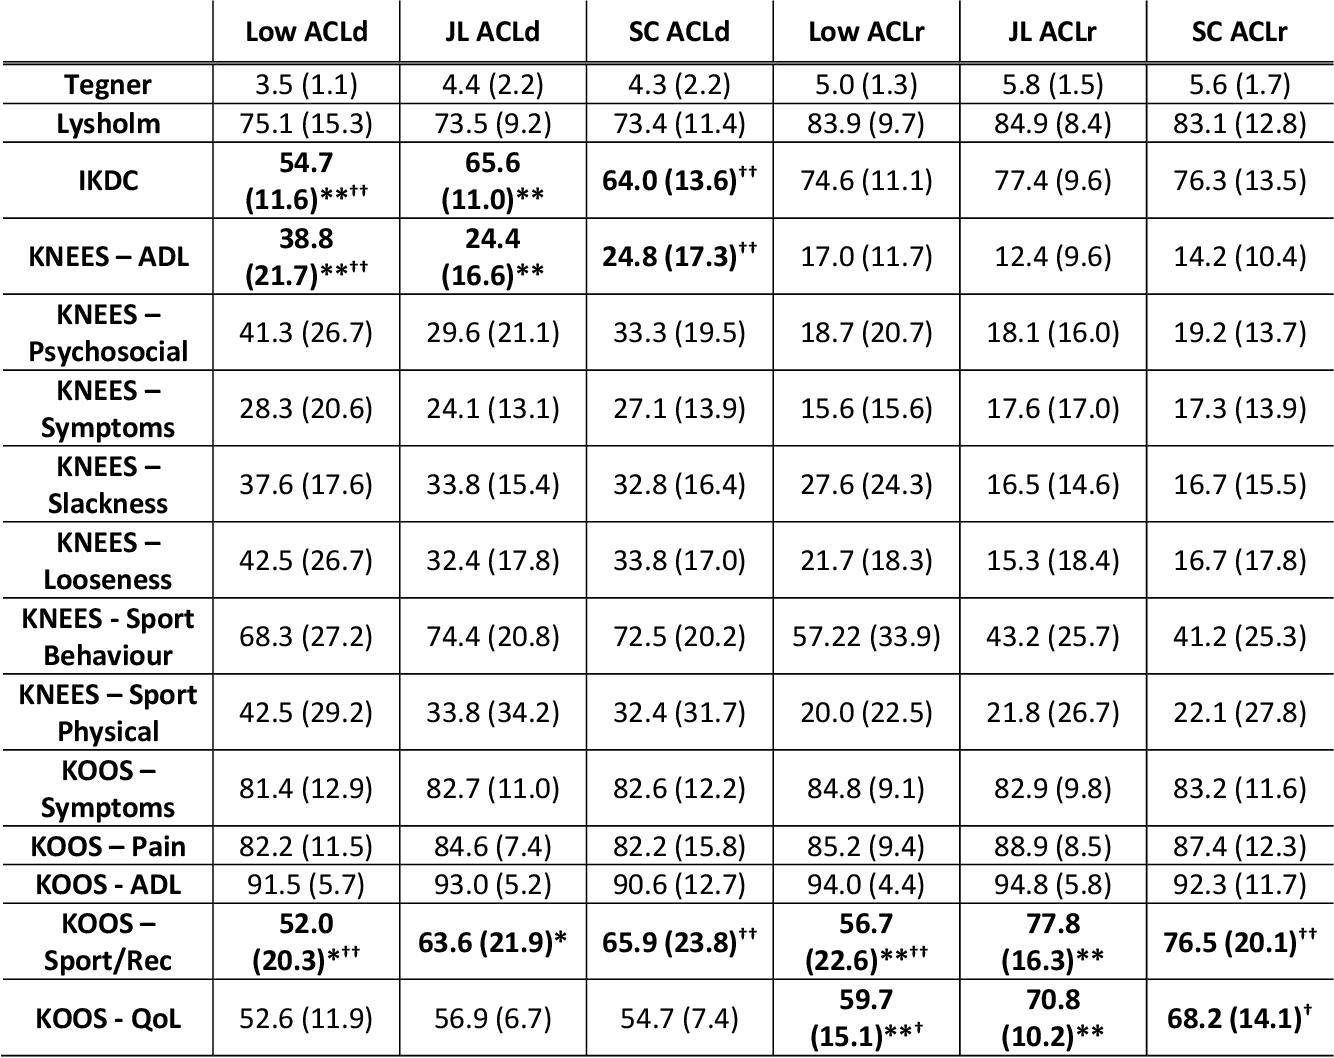 table A.2